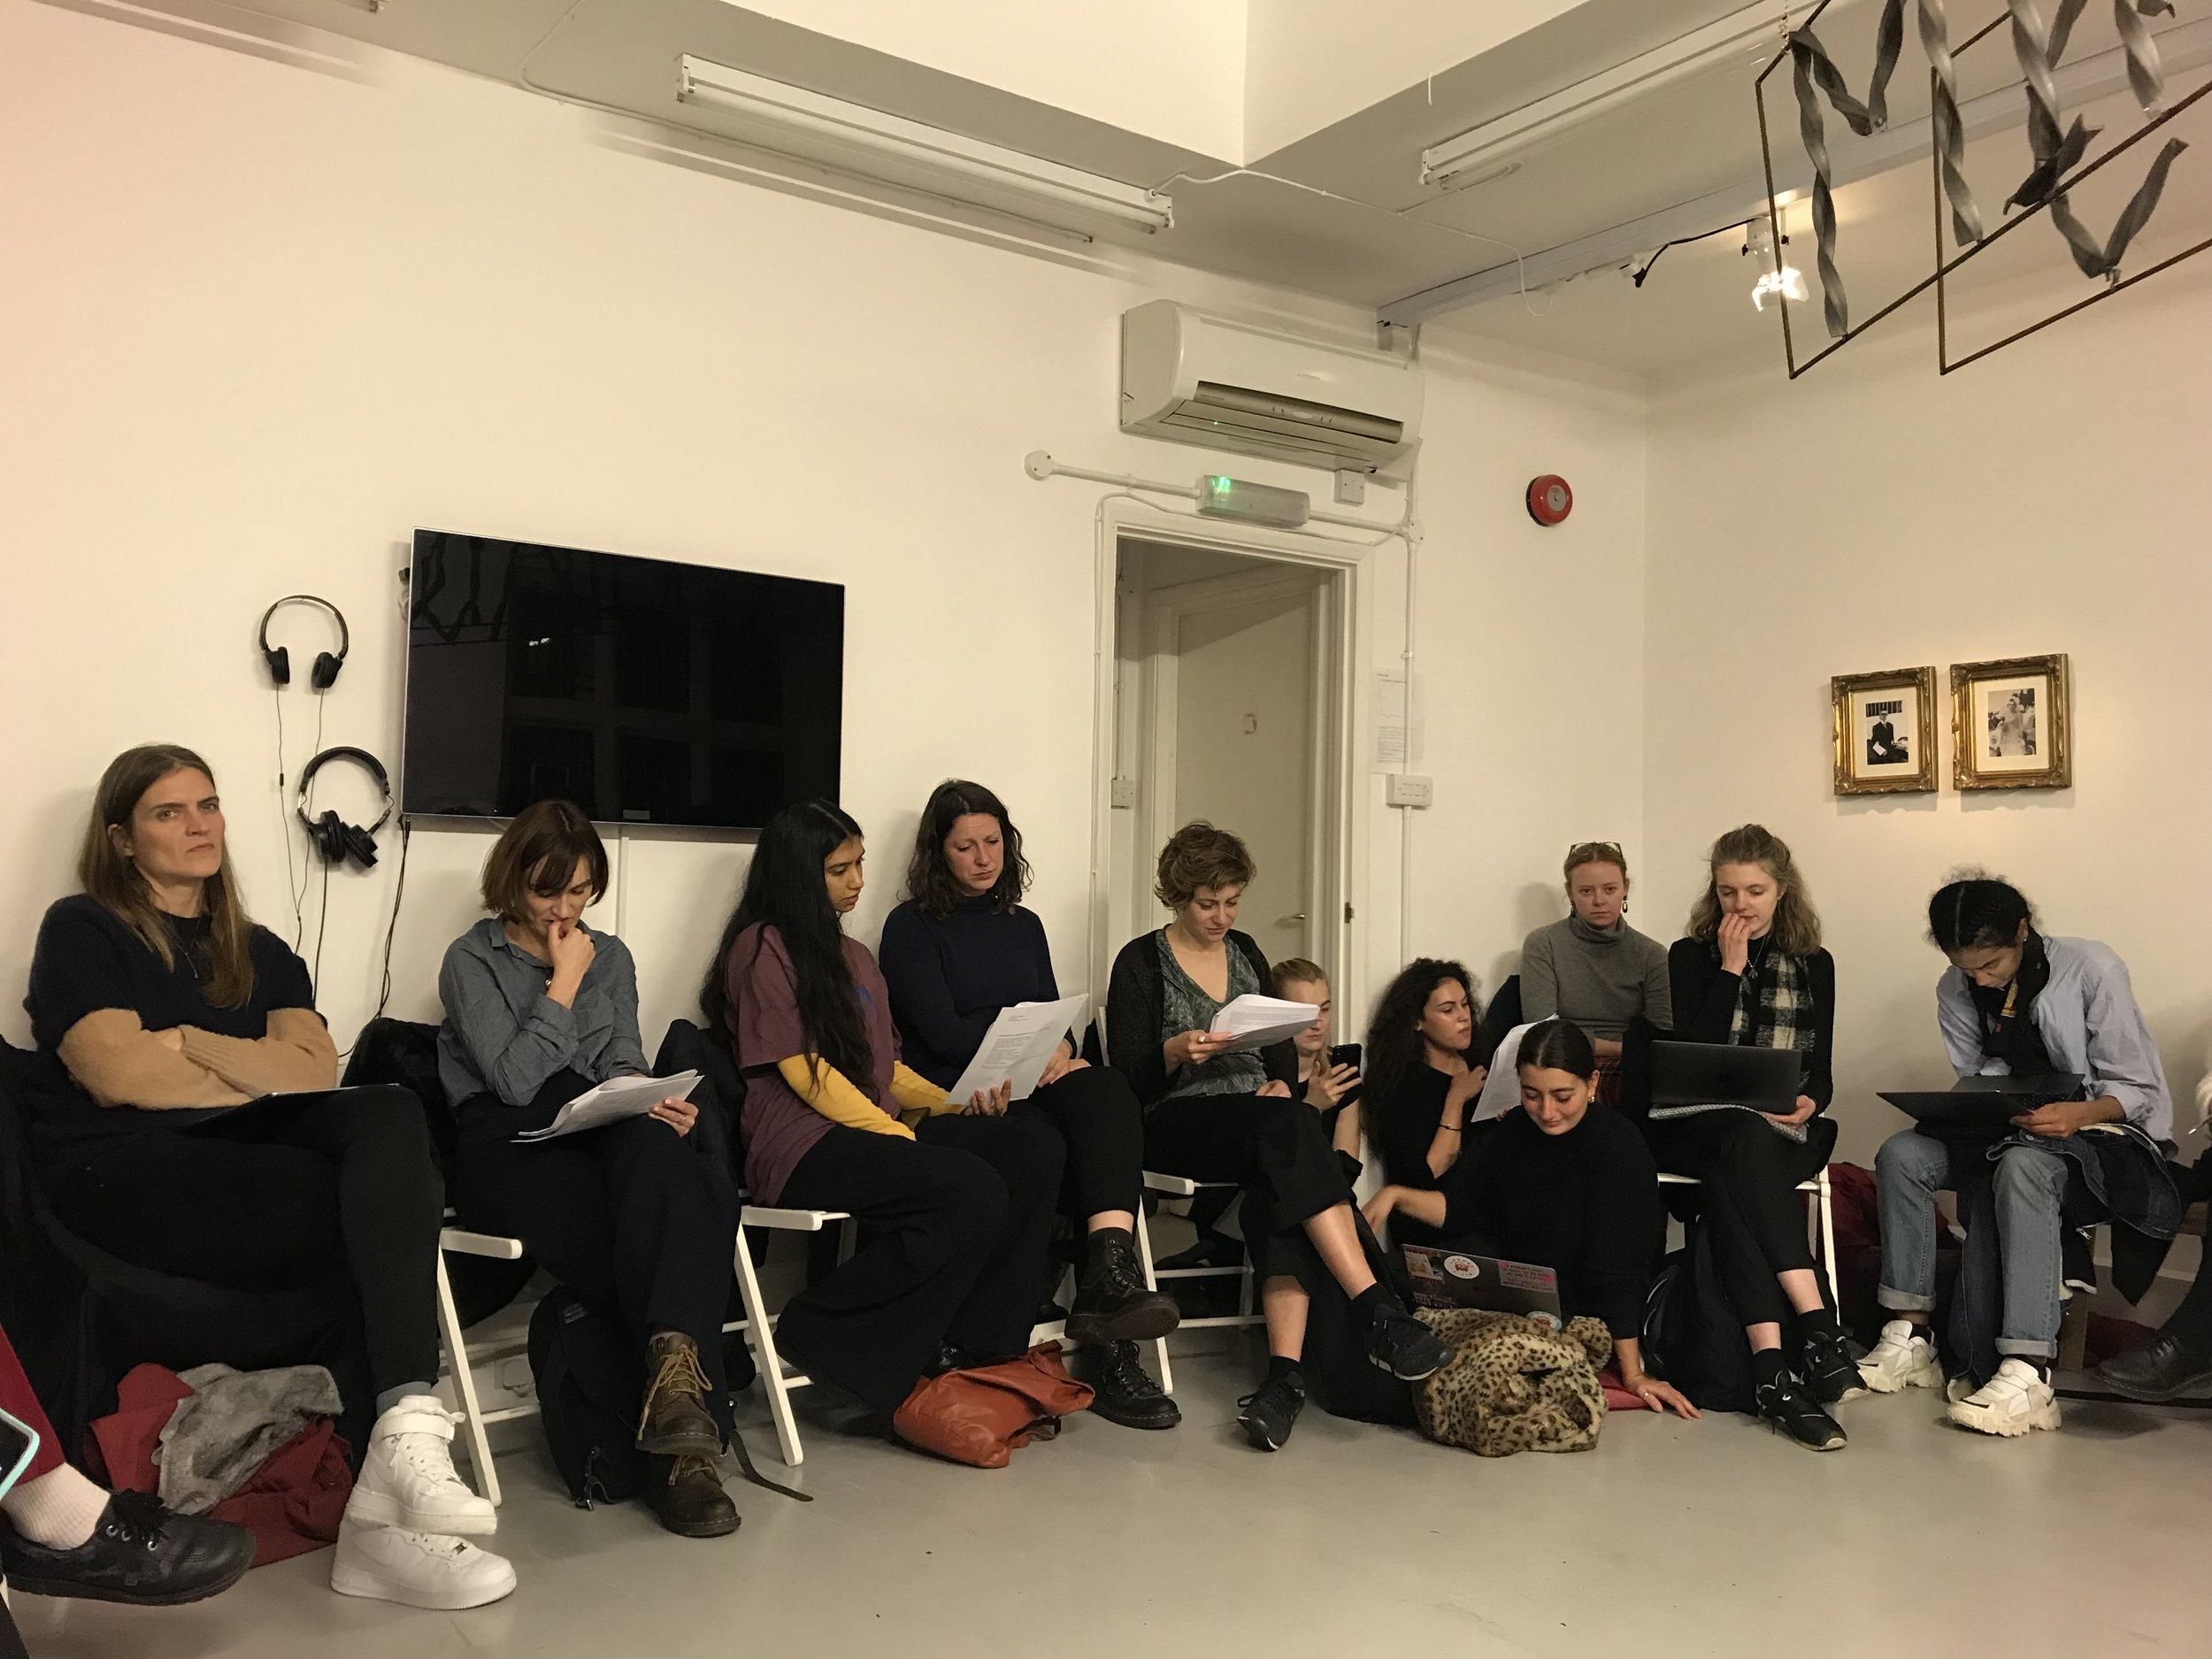 Khariani Barokka & Octavia Butler, Feminist Duration Reading Group, Mimosa House, London, Dec 2018. Photo Helena Reckitt